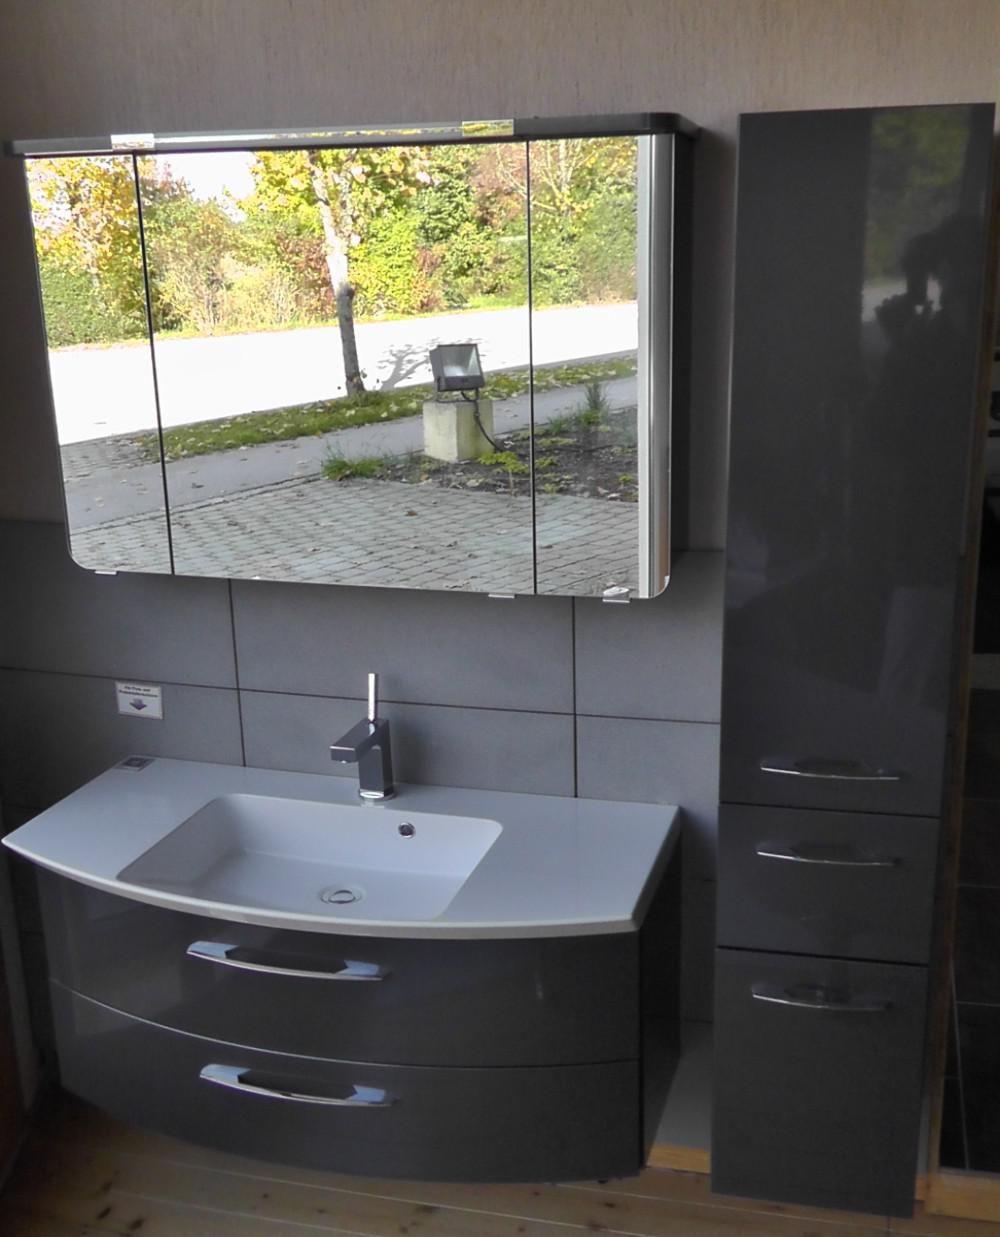 Aquarell Badmobel Badmobel Written By Smartis Share Tweet Pin It Google Email Whatsapp Moderne Badezimmer Mobel Platzsparende B In 2020 Vanity Double Vanity Bathroom